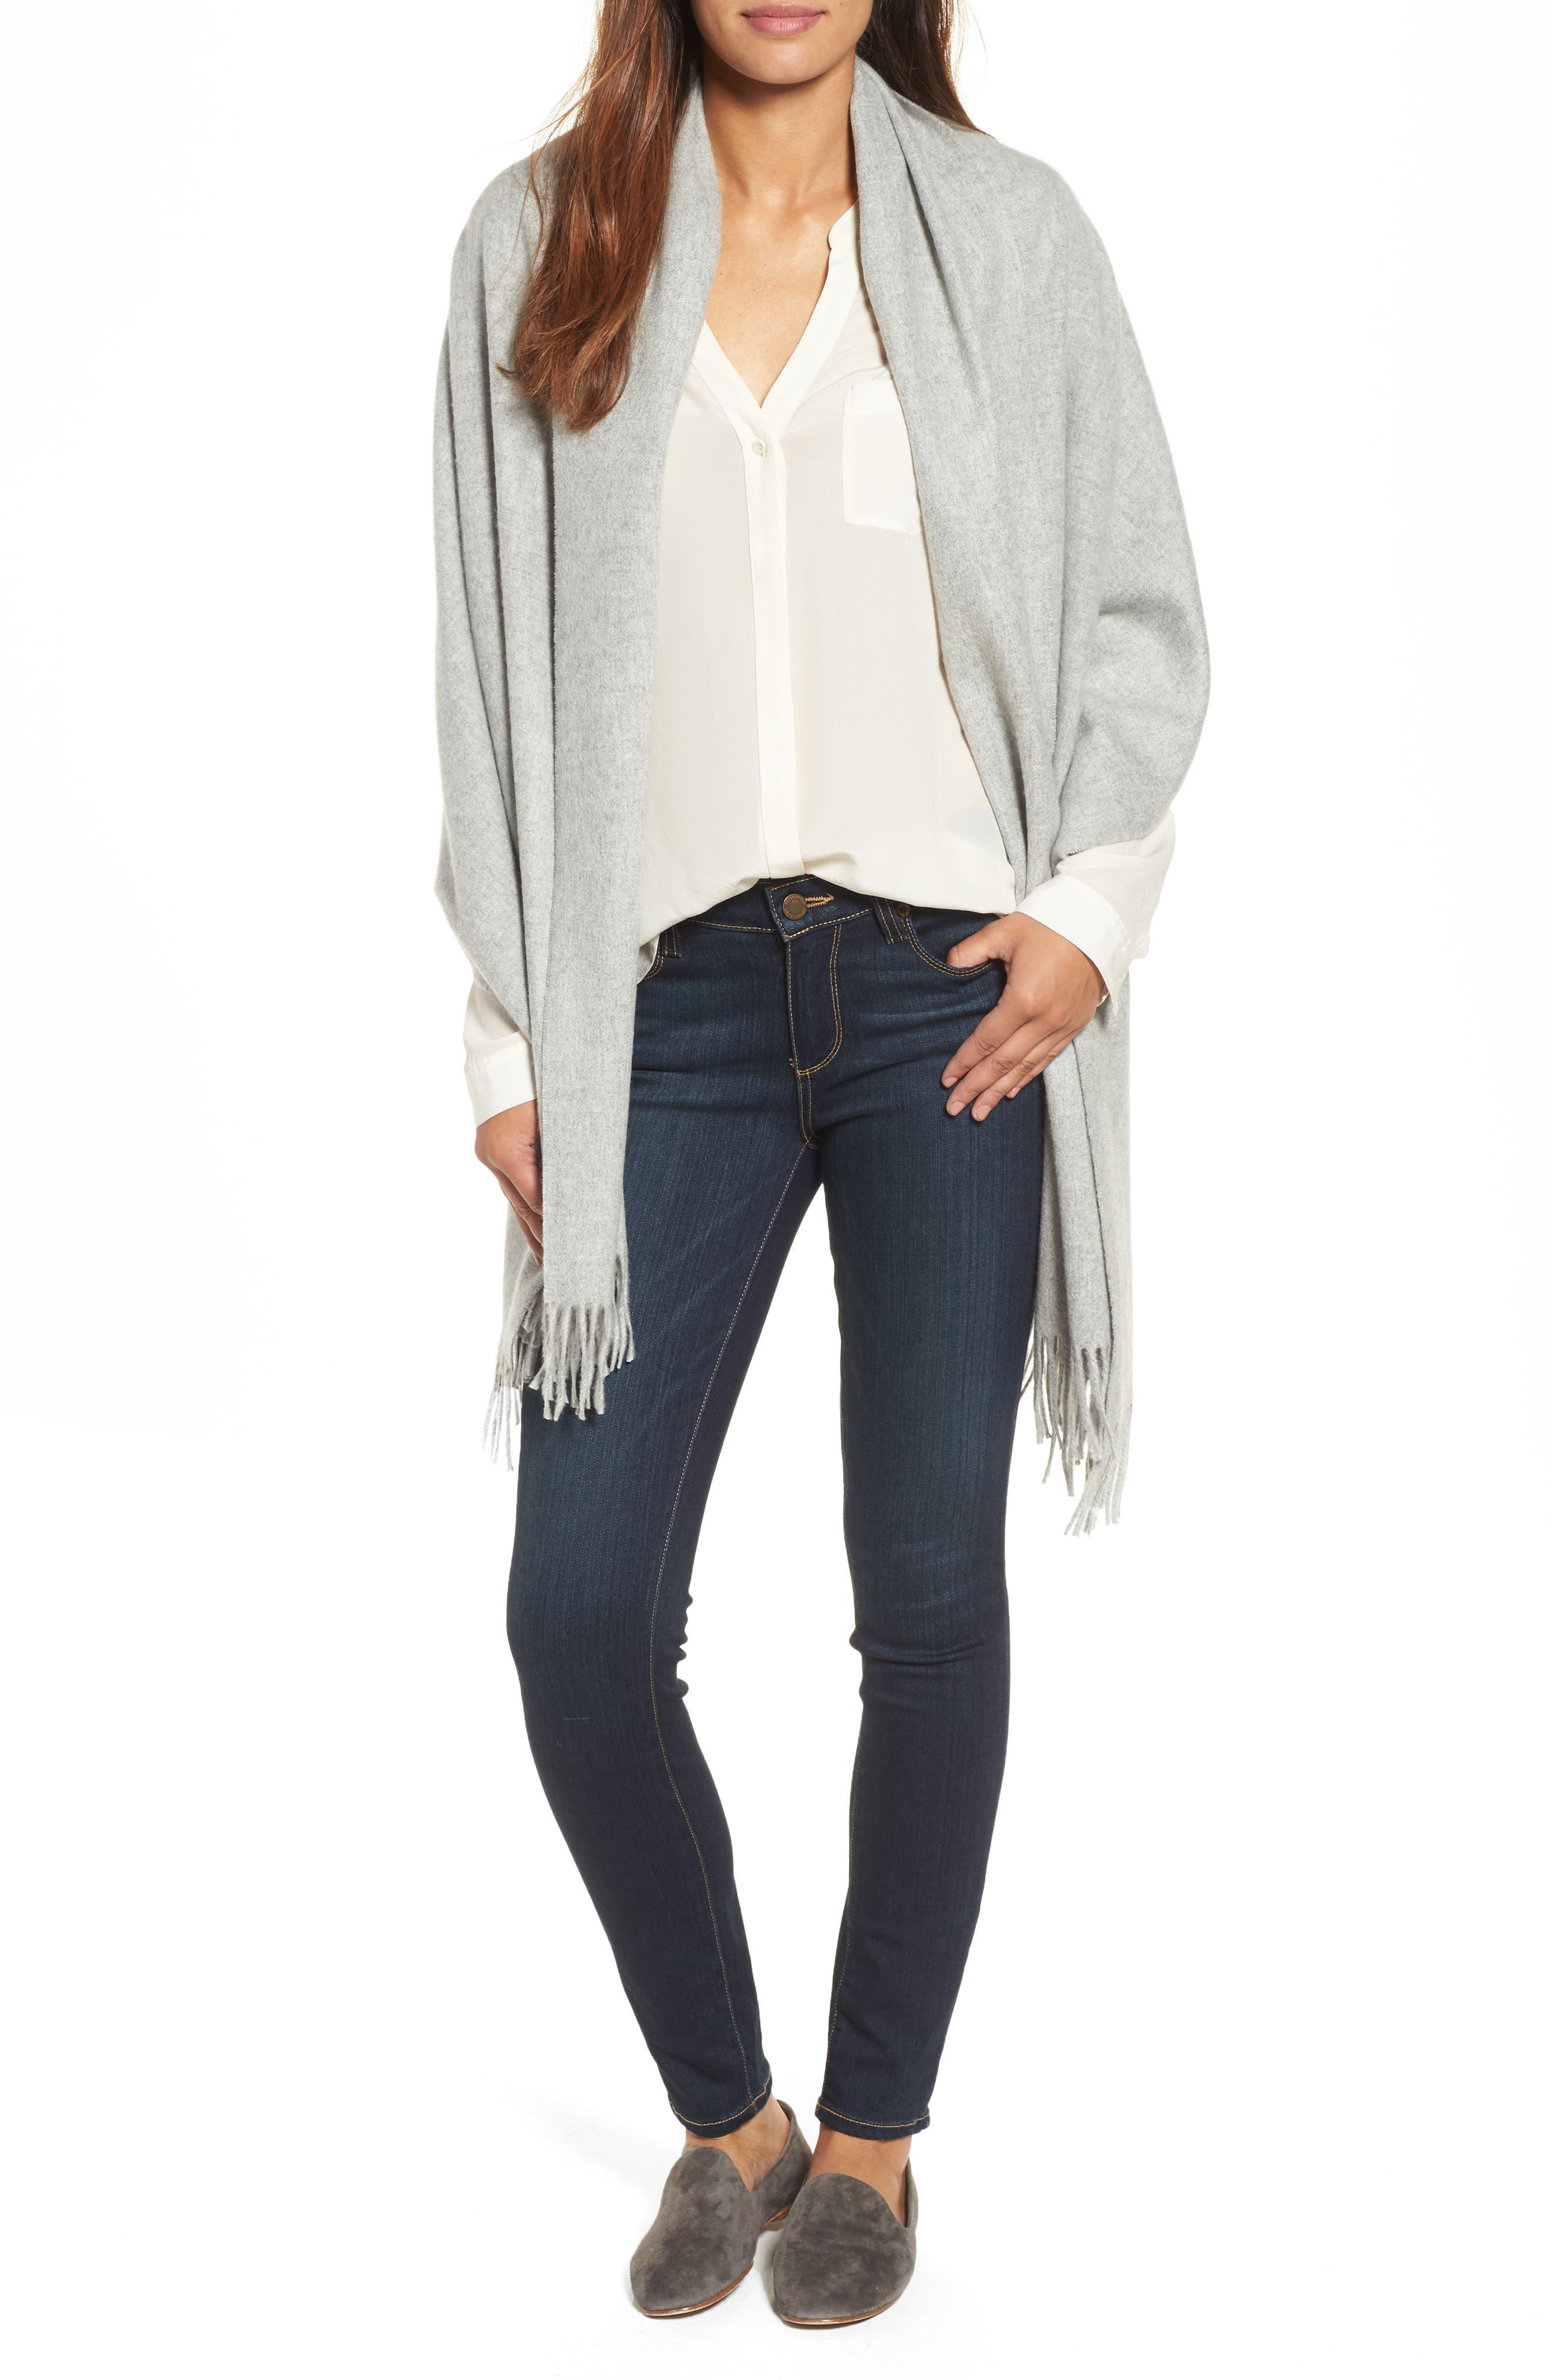 Oversize Cashmere Wrap,                             Main thumbnail 1, color,                             Grey Soft Heather